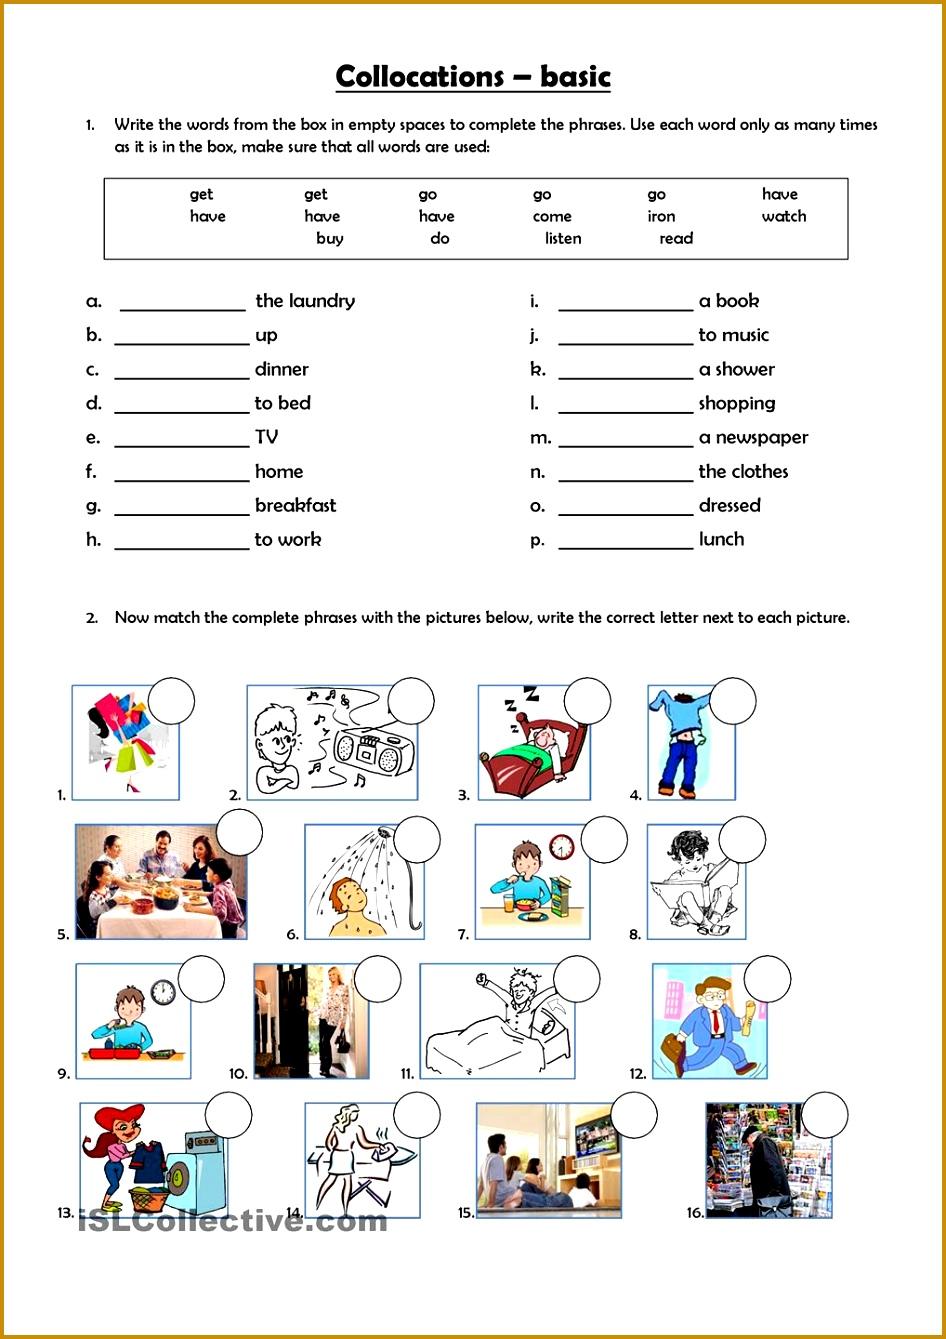 Daily Routines Speaking Cards worksheet Free ESL printable worksheets made by teachers 1339946